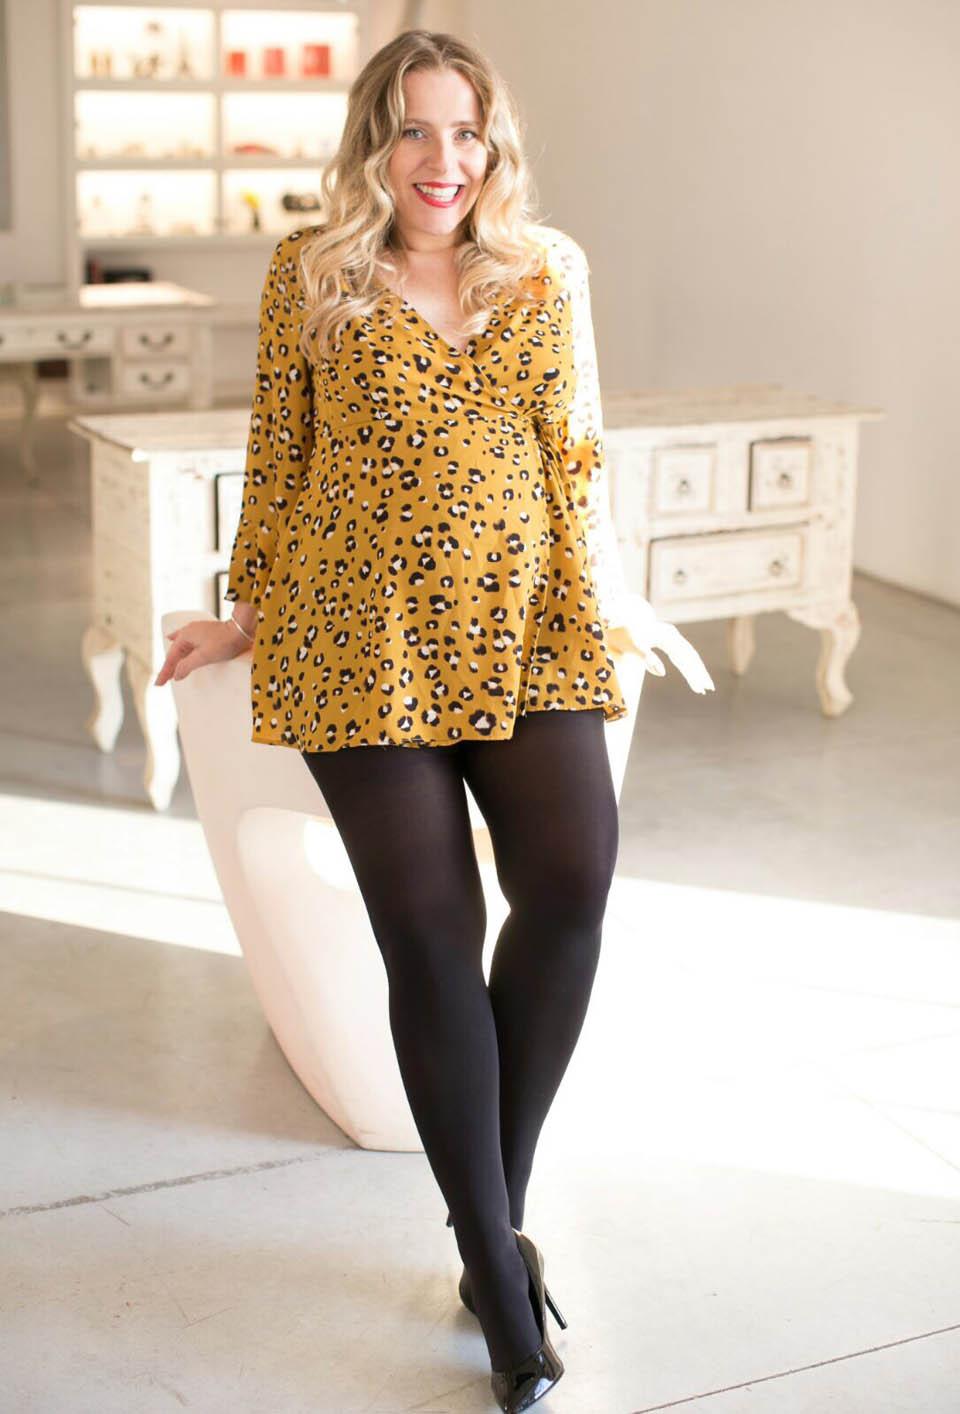 Михаль на 7-м месяце. Рубашка Рами Леви, колготки H&M, туфли Aldo. Фото: Анат Казул